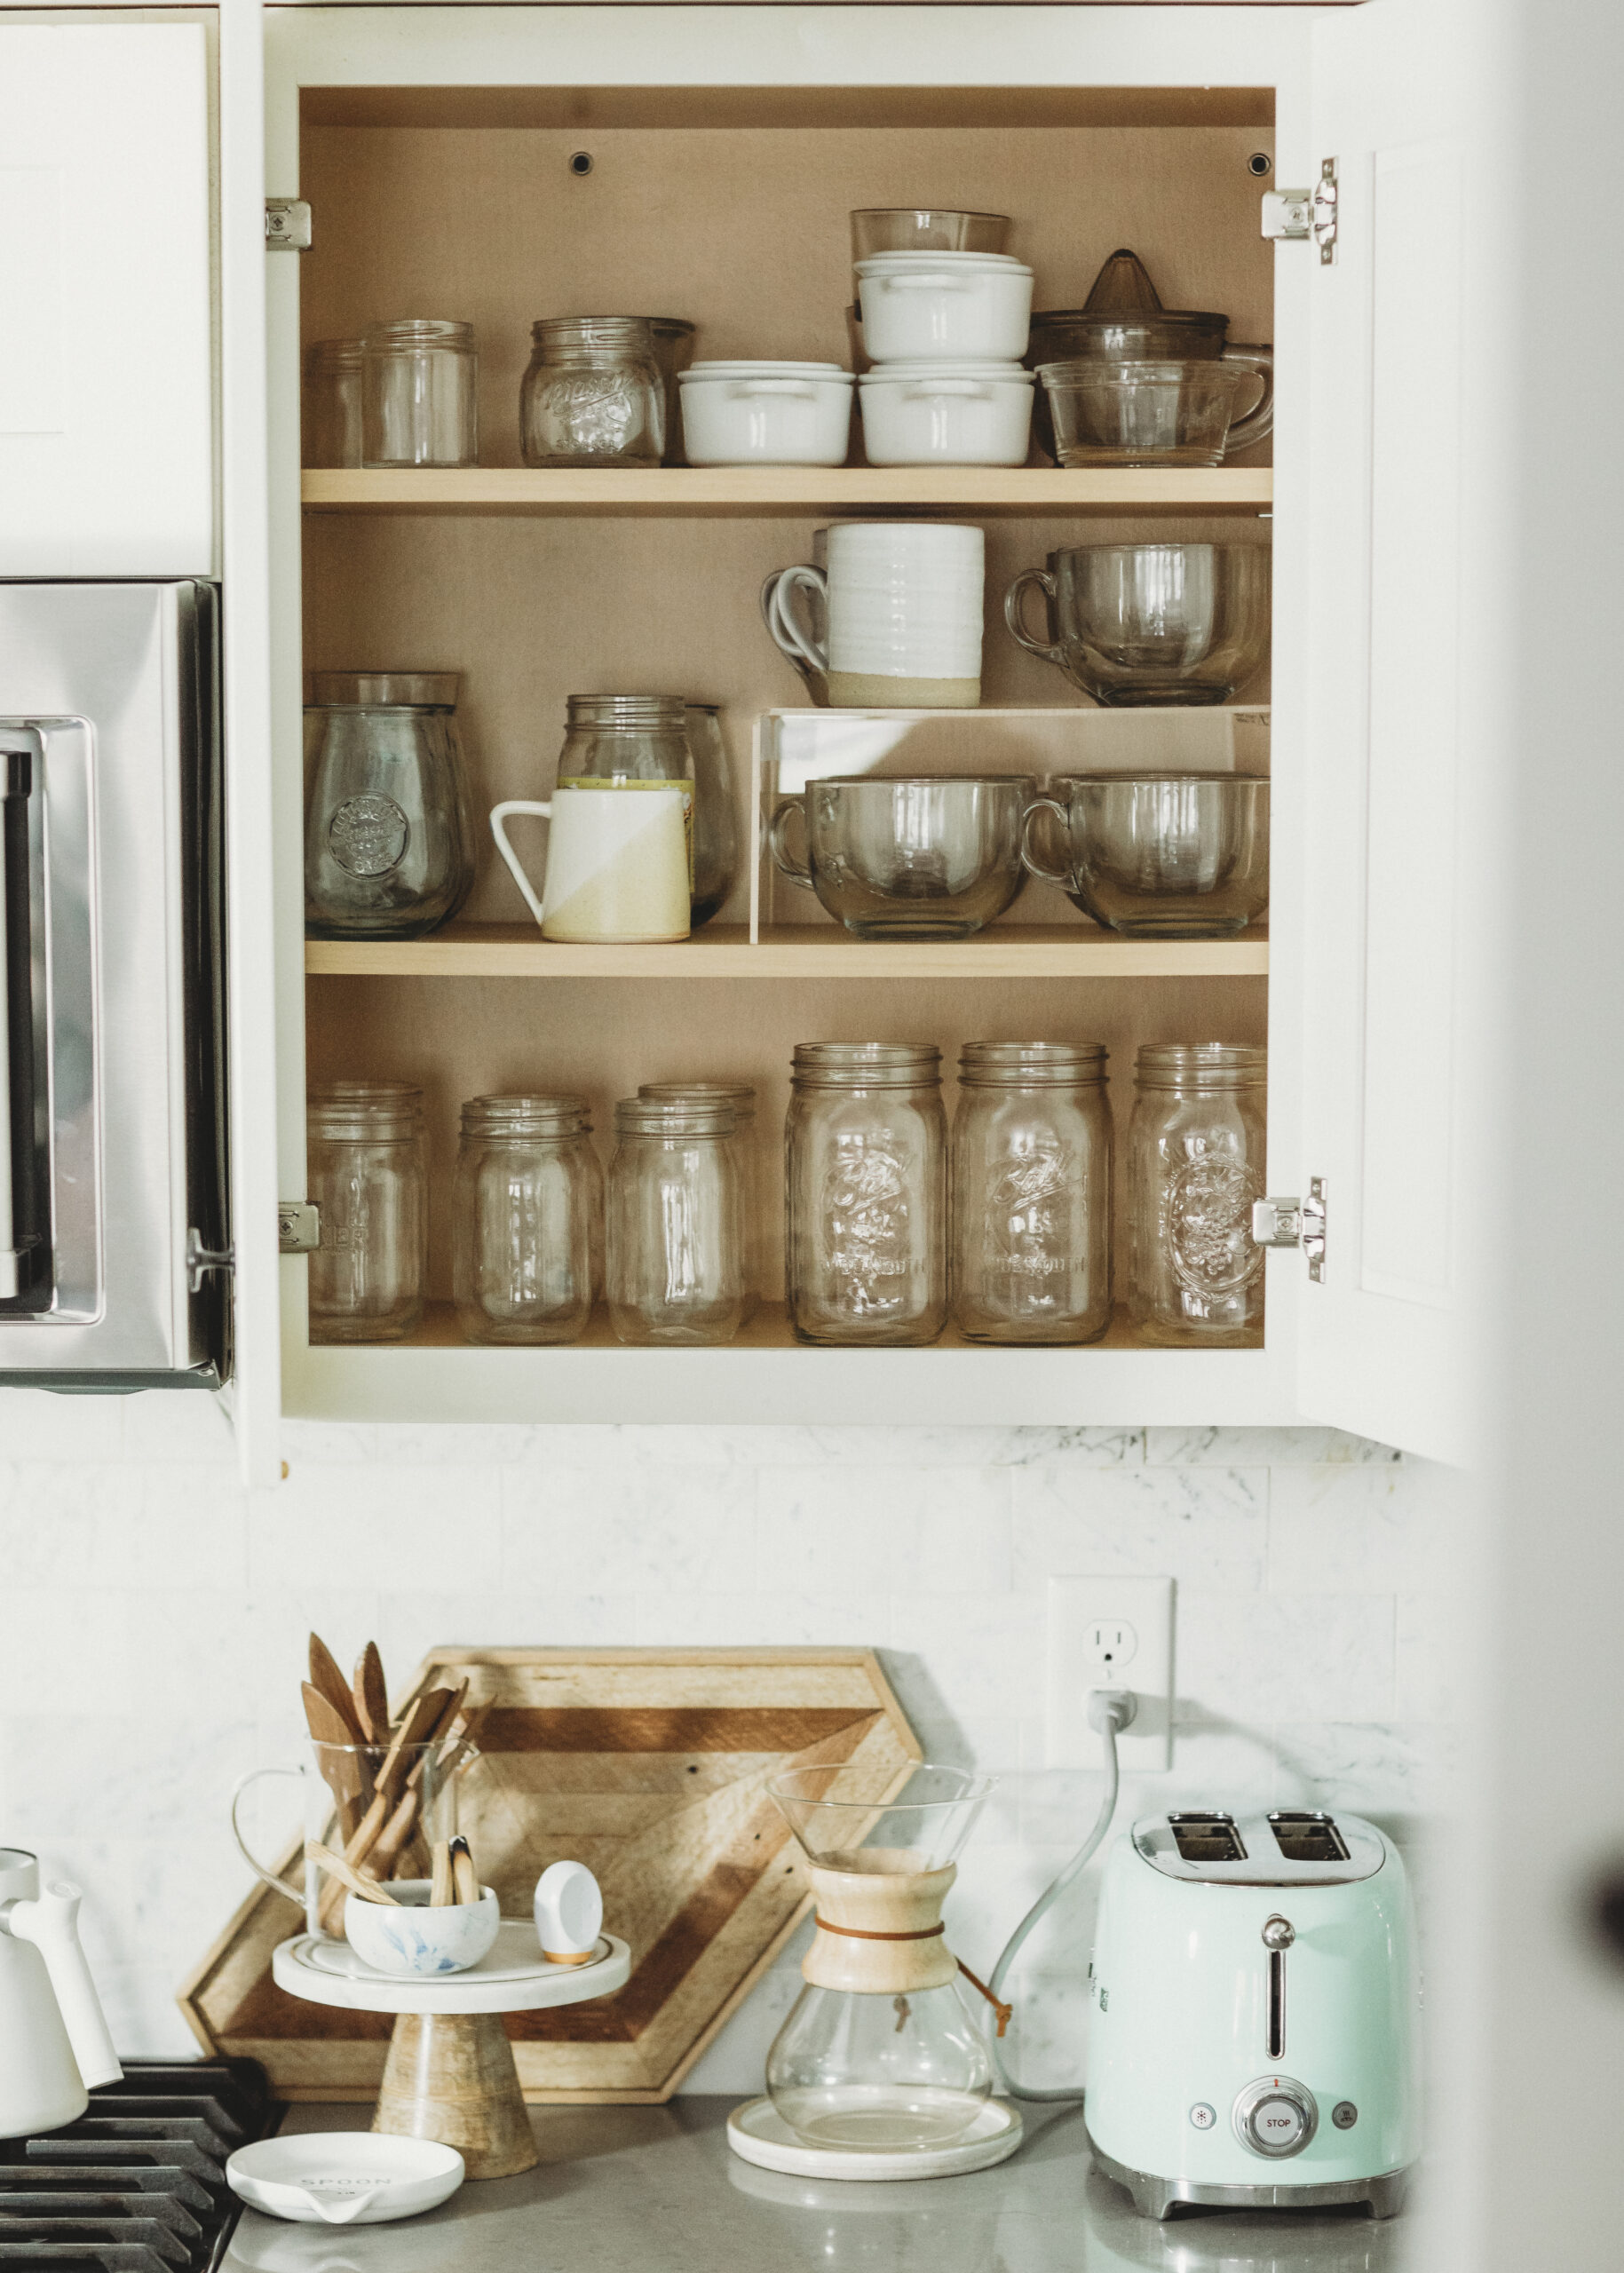 Small Kitchen Organization 101 by a Professional Organizer